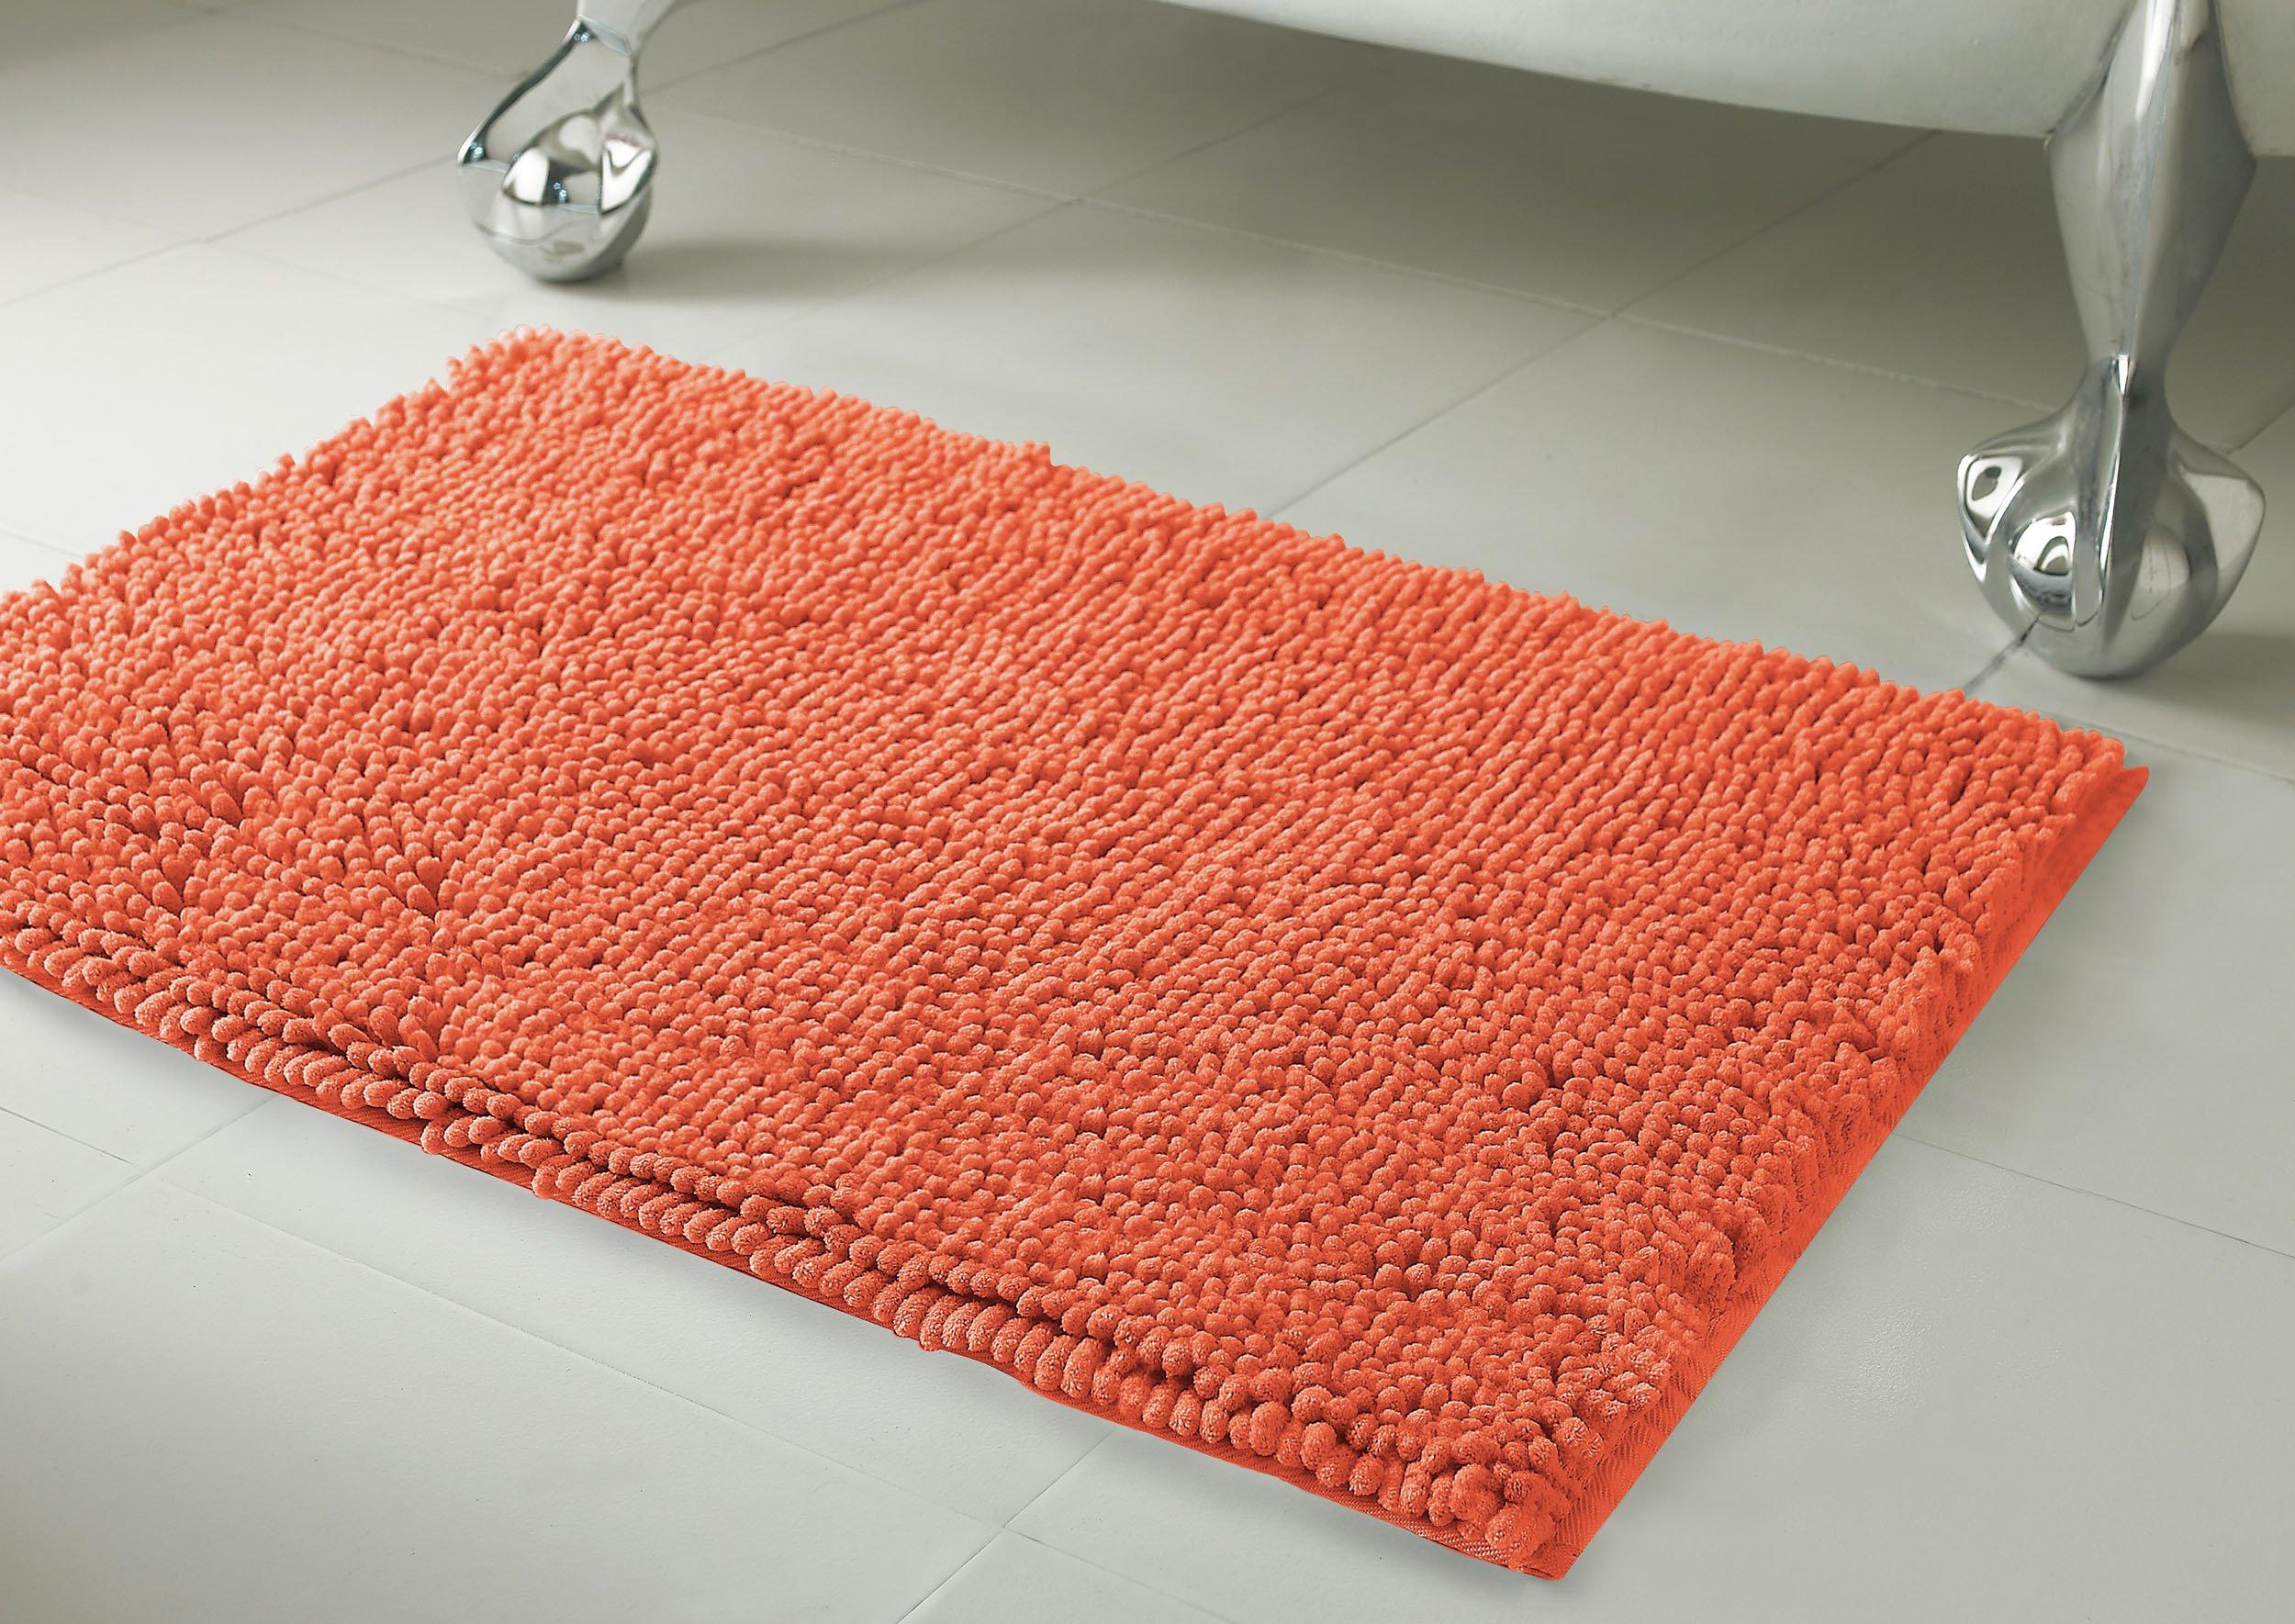 Resort Collection Plush Shag Chenille 17 x 24'' Bath Mat, Coral